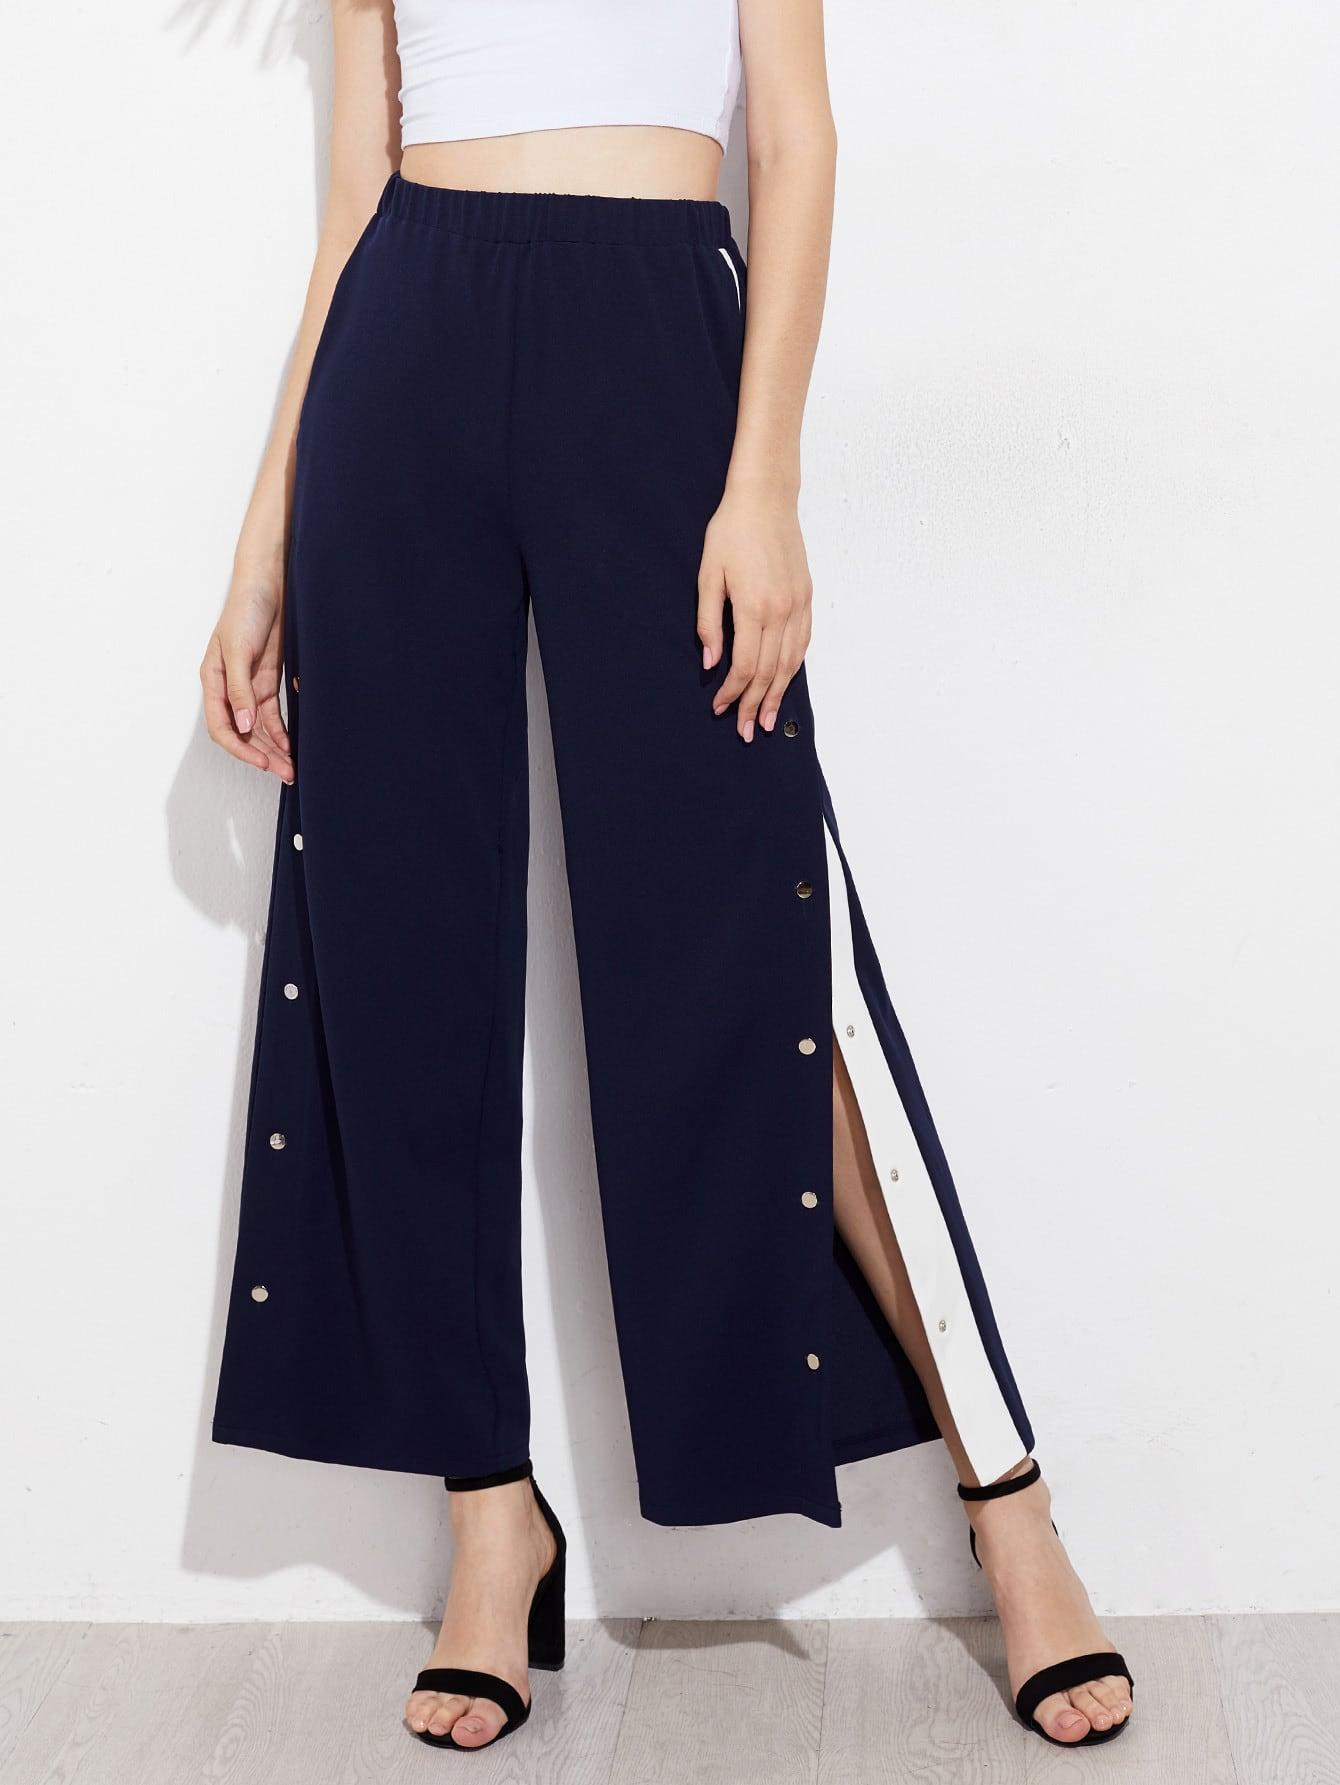 Snap Button Contrast Panel Side Pants contrast panel side pleated harem pants